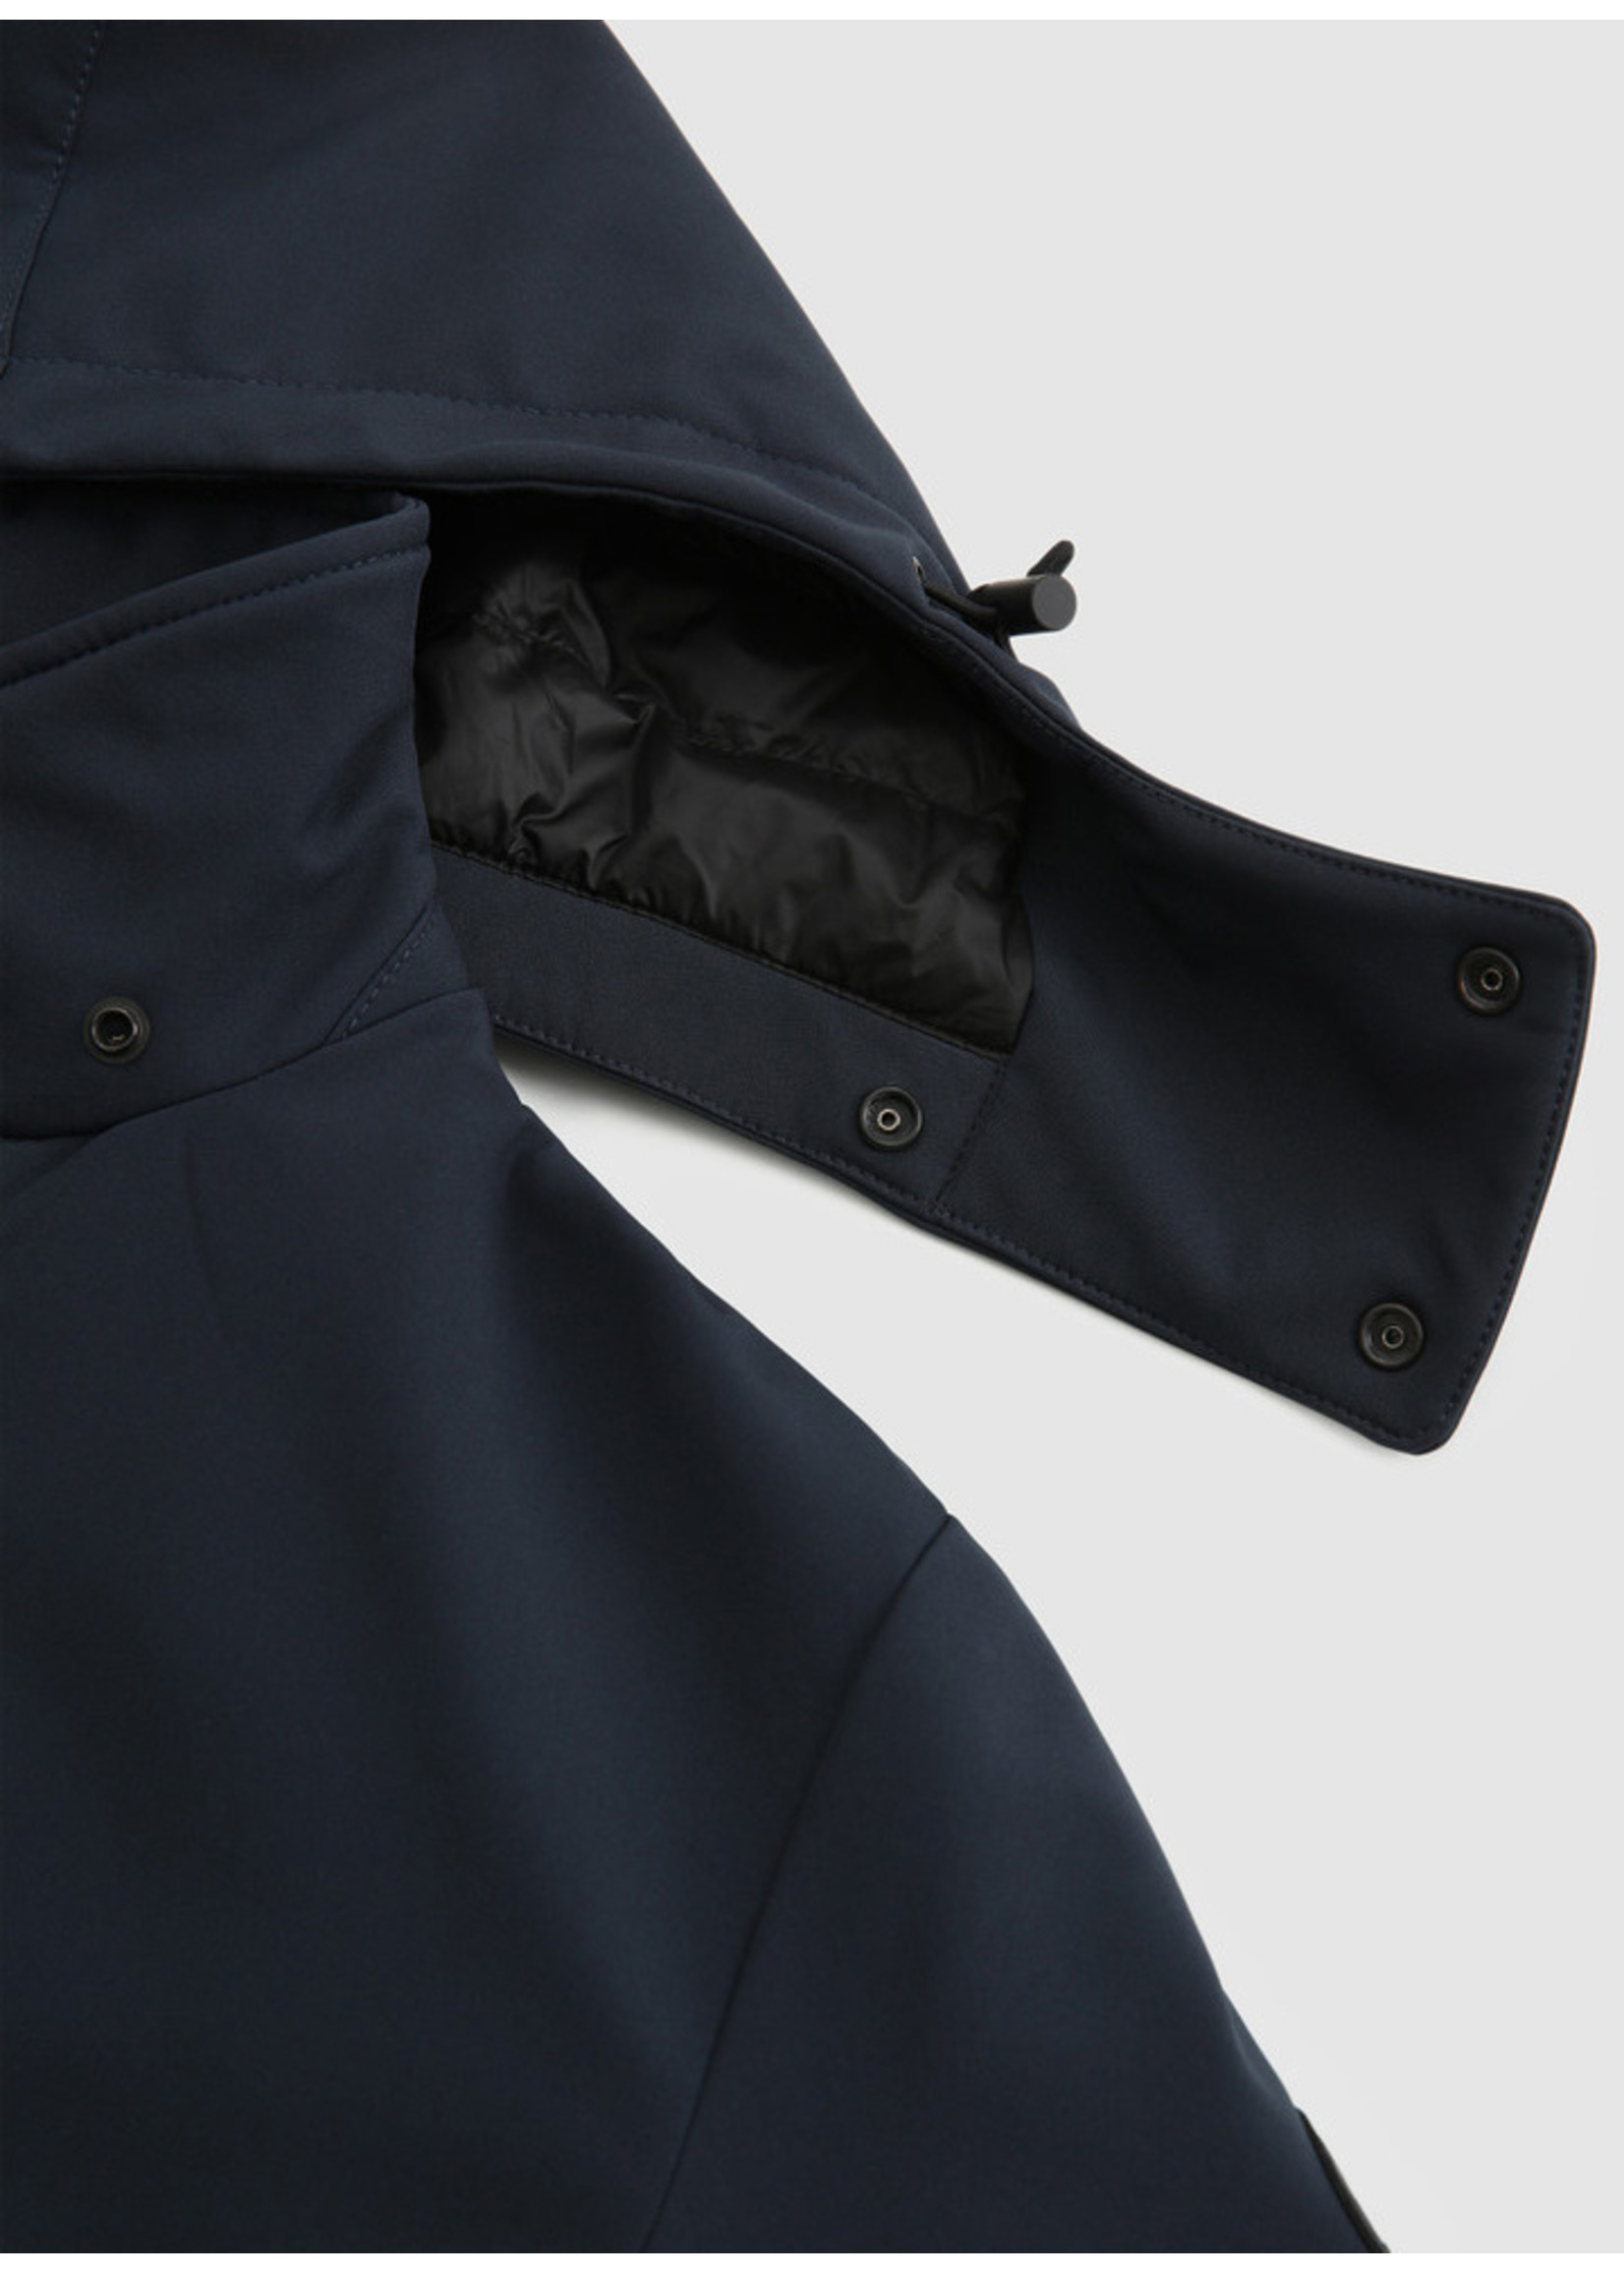 Woolrich Barrow Mac Soft Shell Coat Melton Blue